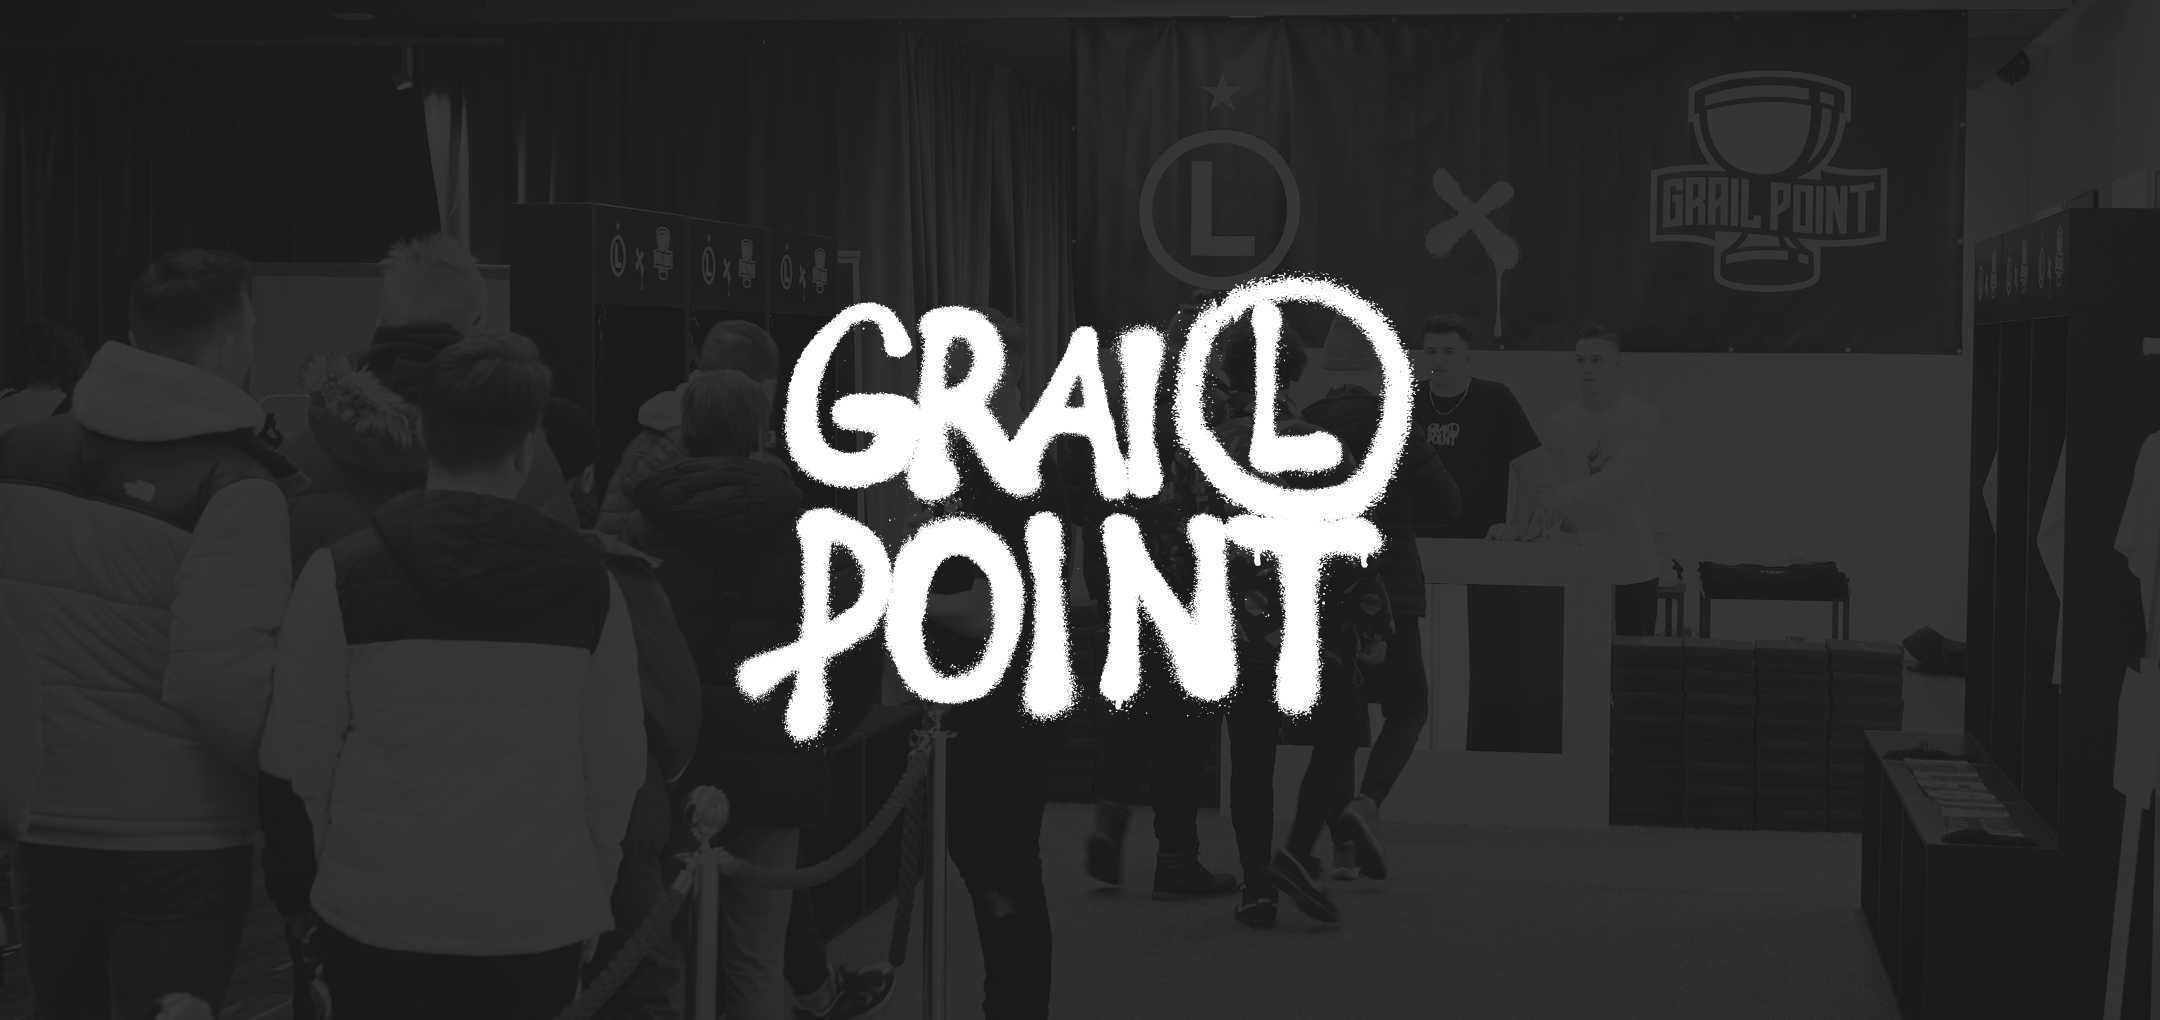 Legia Warszawa & Grail Point collab [Wideo]